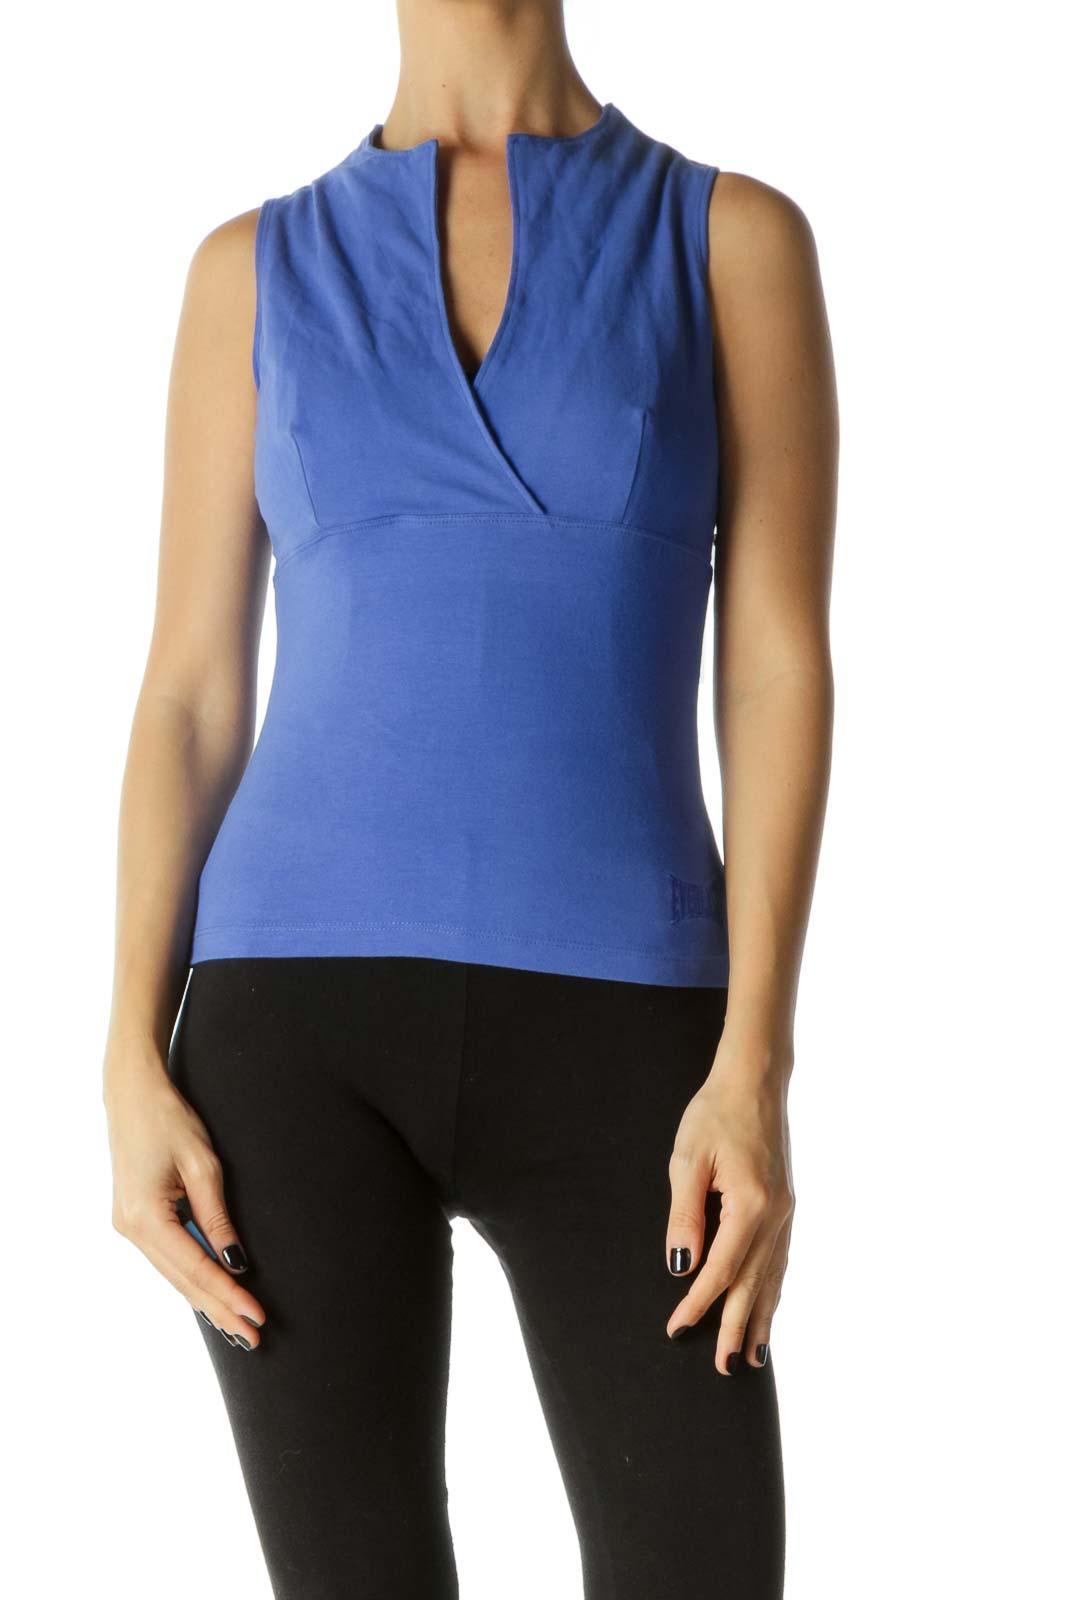 Blue V-neck Sleeveless Yoga Top Front